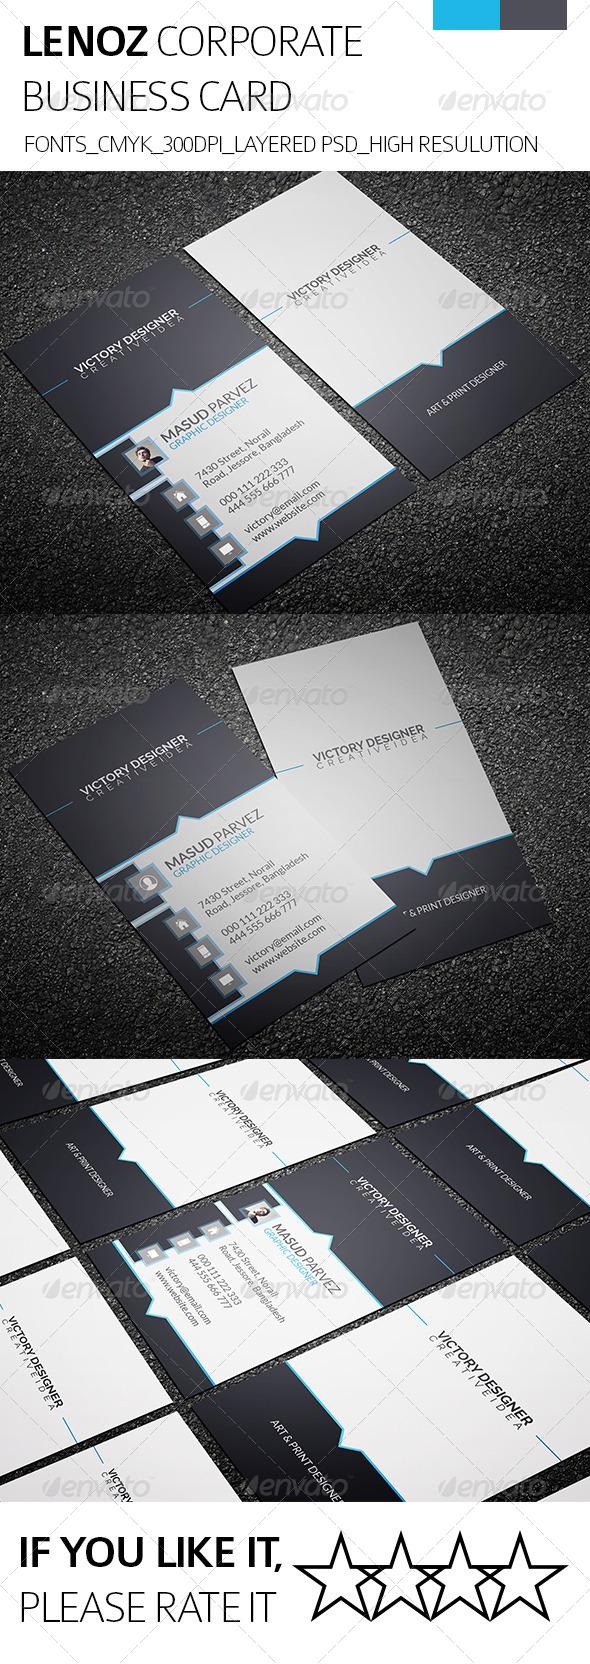 Lenoz & Corporate Business Card - Corporate Business Cards